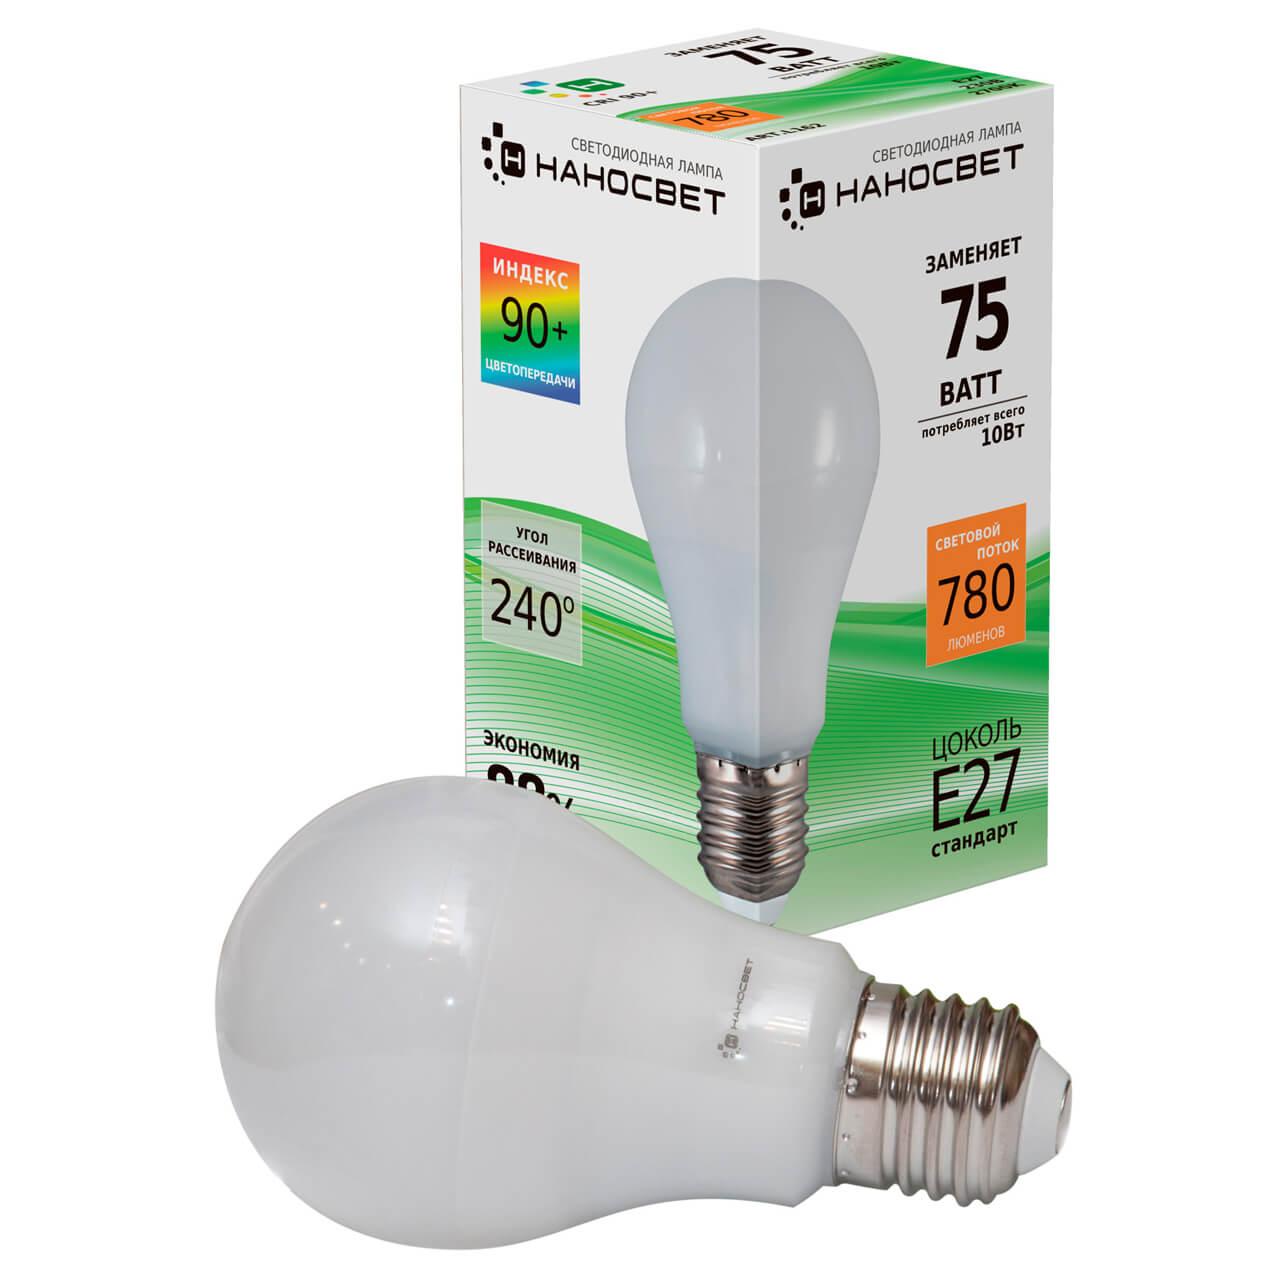 Лампа светодиодная Наносвет E27 10W 2700K матовая LE-GLS-10/E27/827 L162 лампа светодиодная e27 6w 2700k свеча матовая le cd 6 e27 827 l252